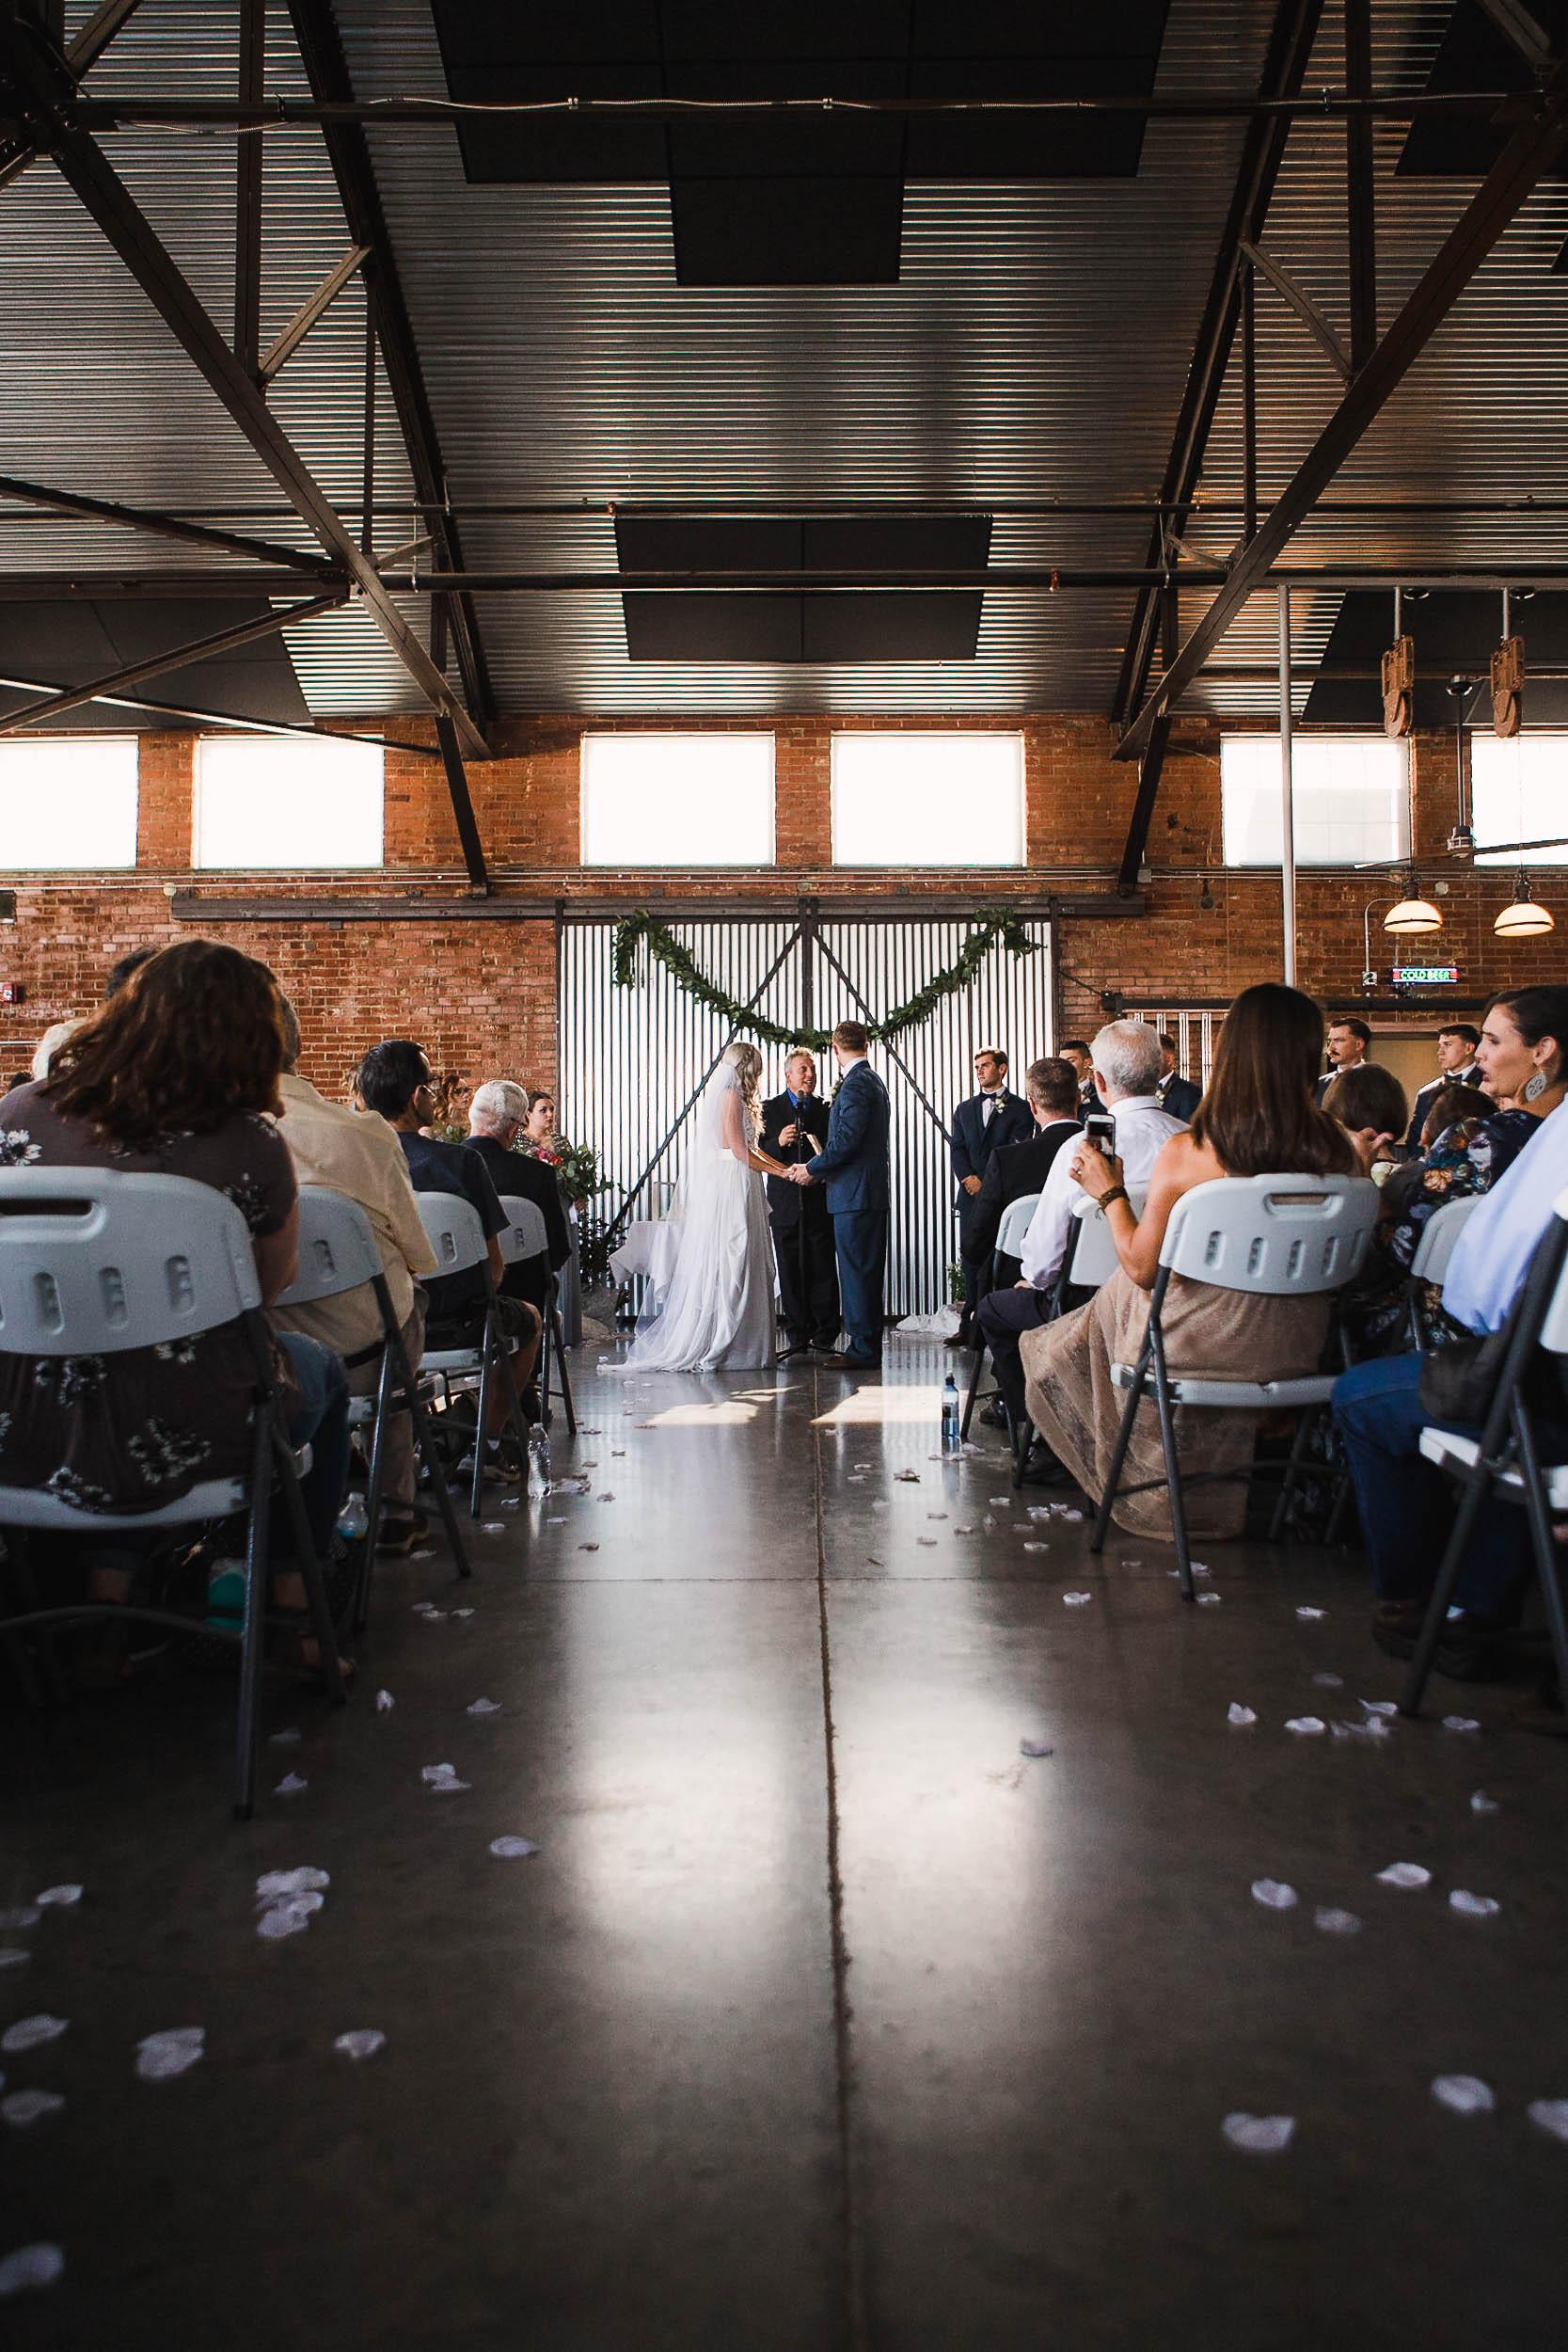 The Hangar Bar and Grill Casper Wyoming Wedding Ceremony